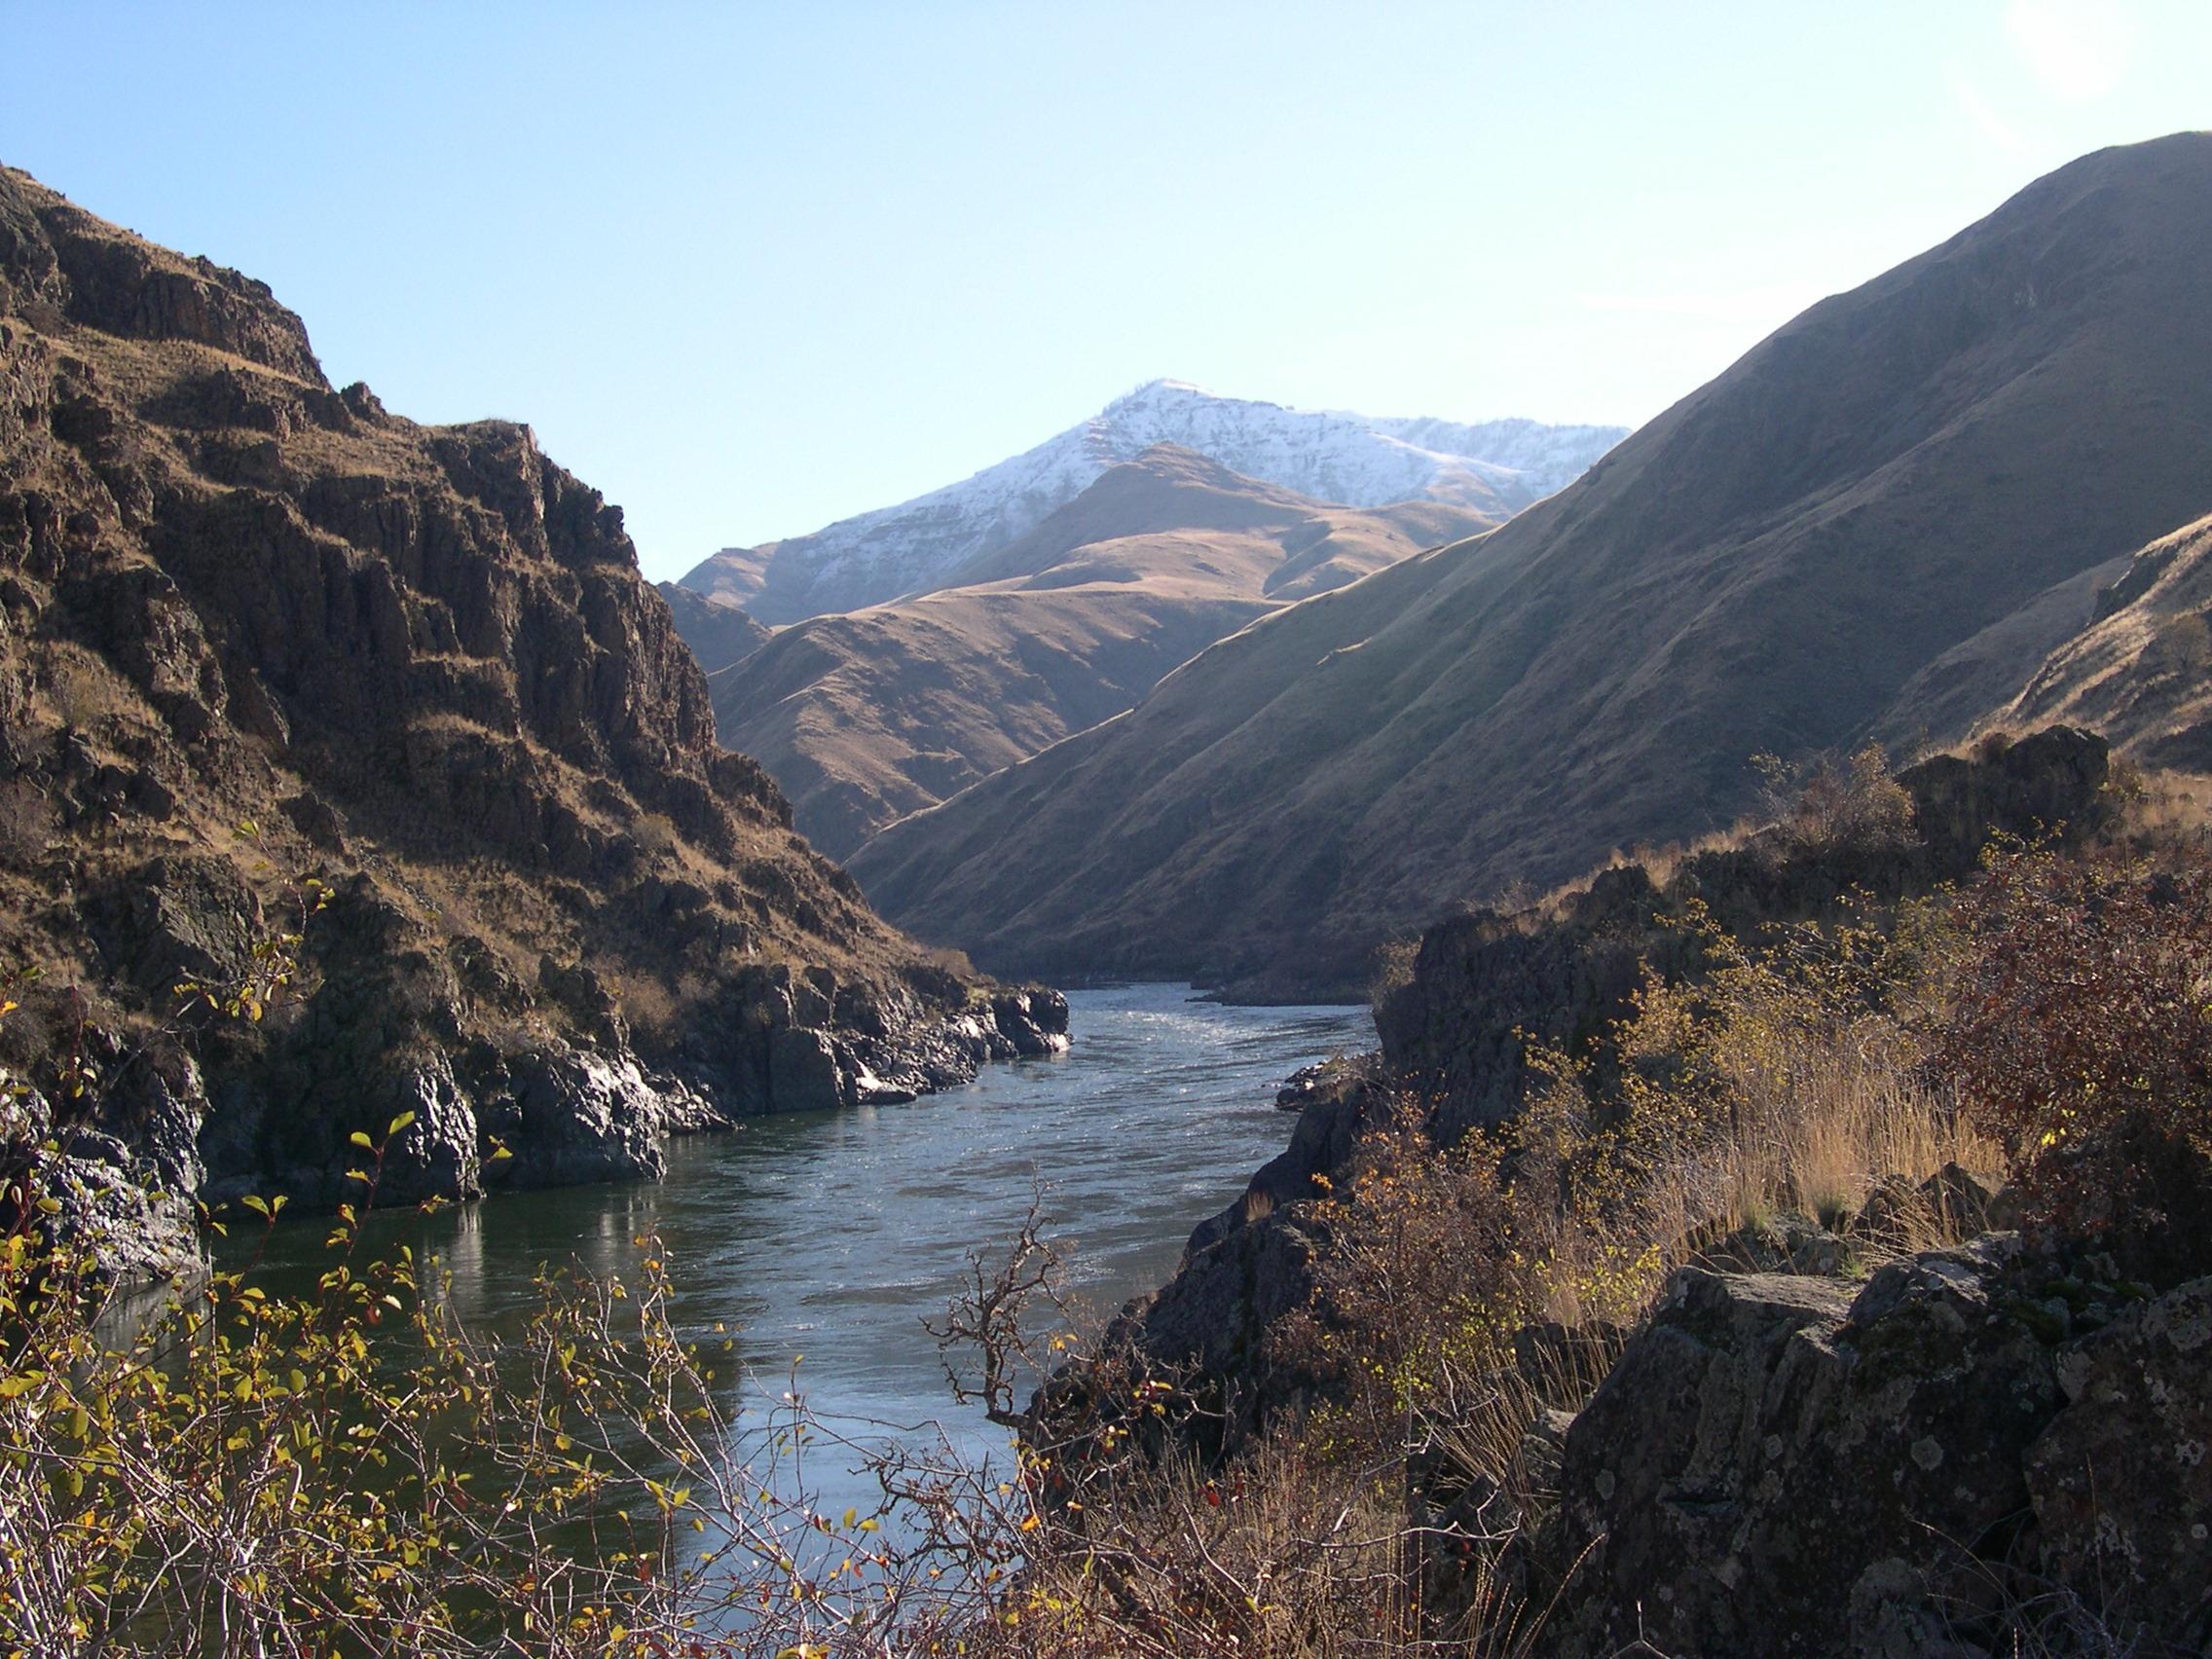 River_shot